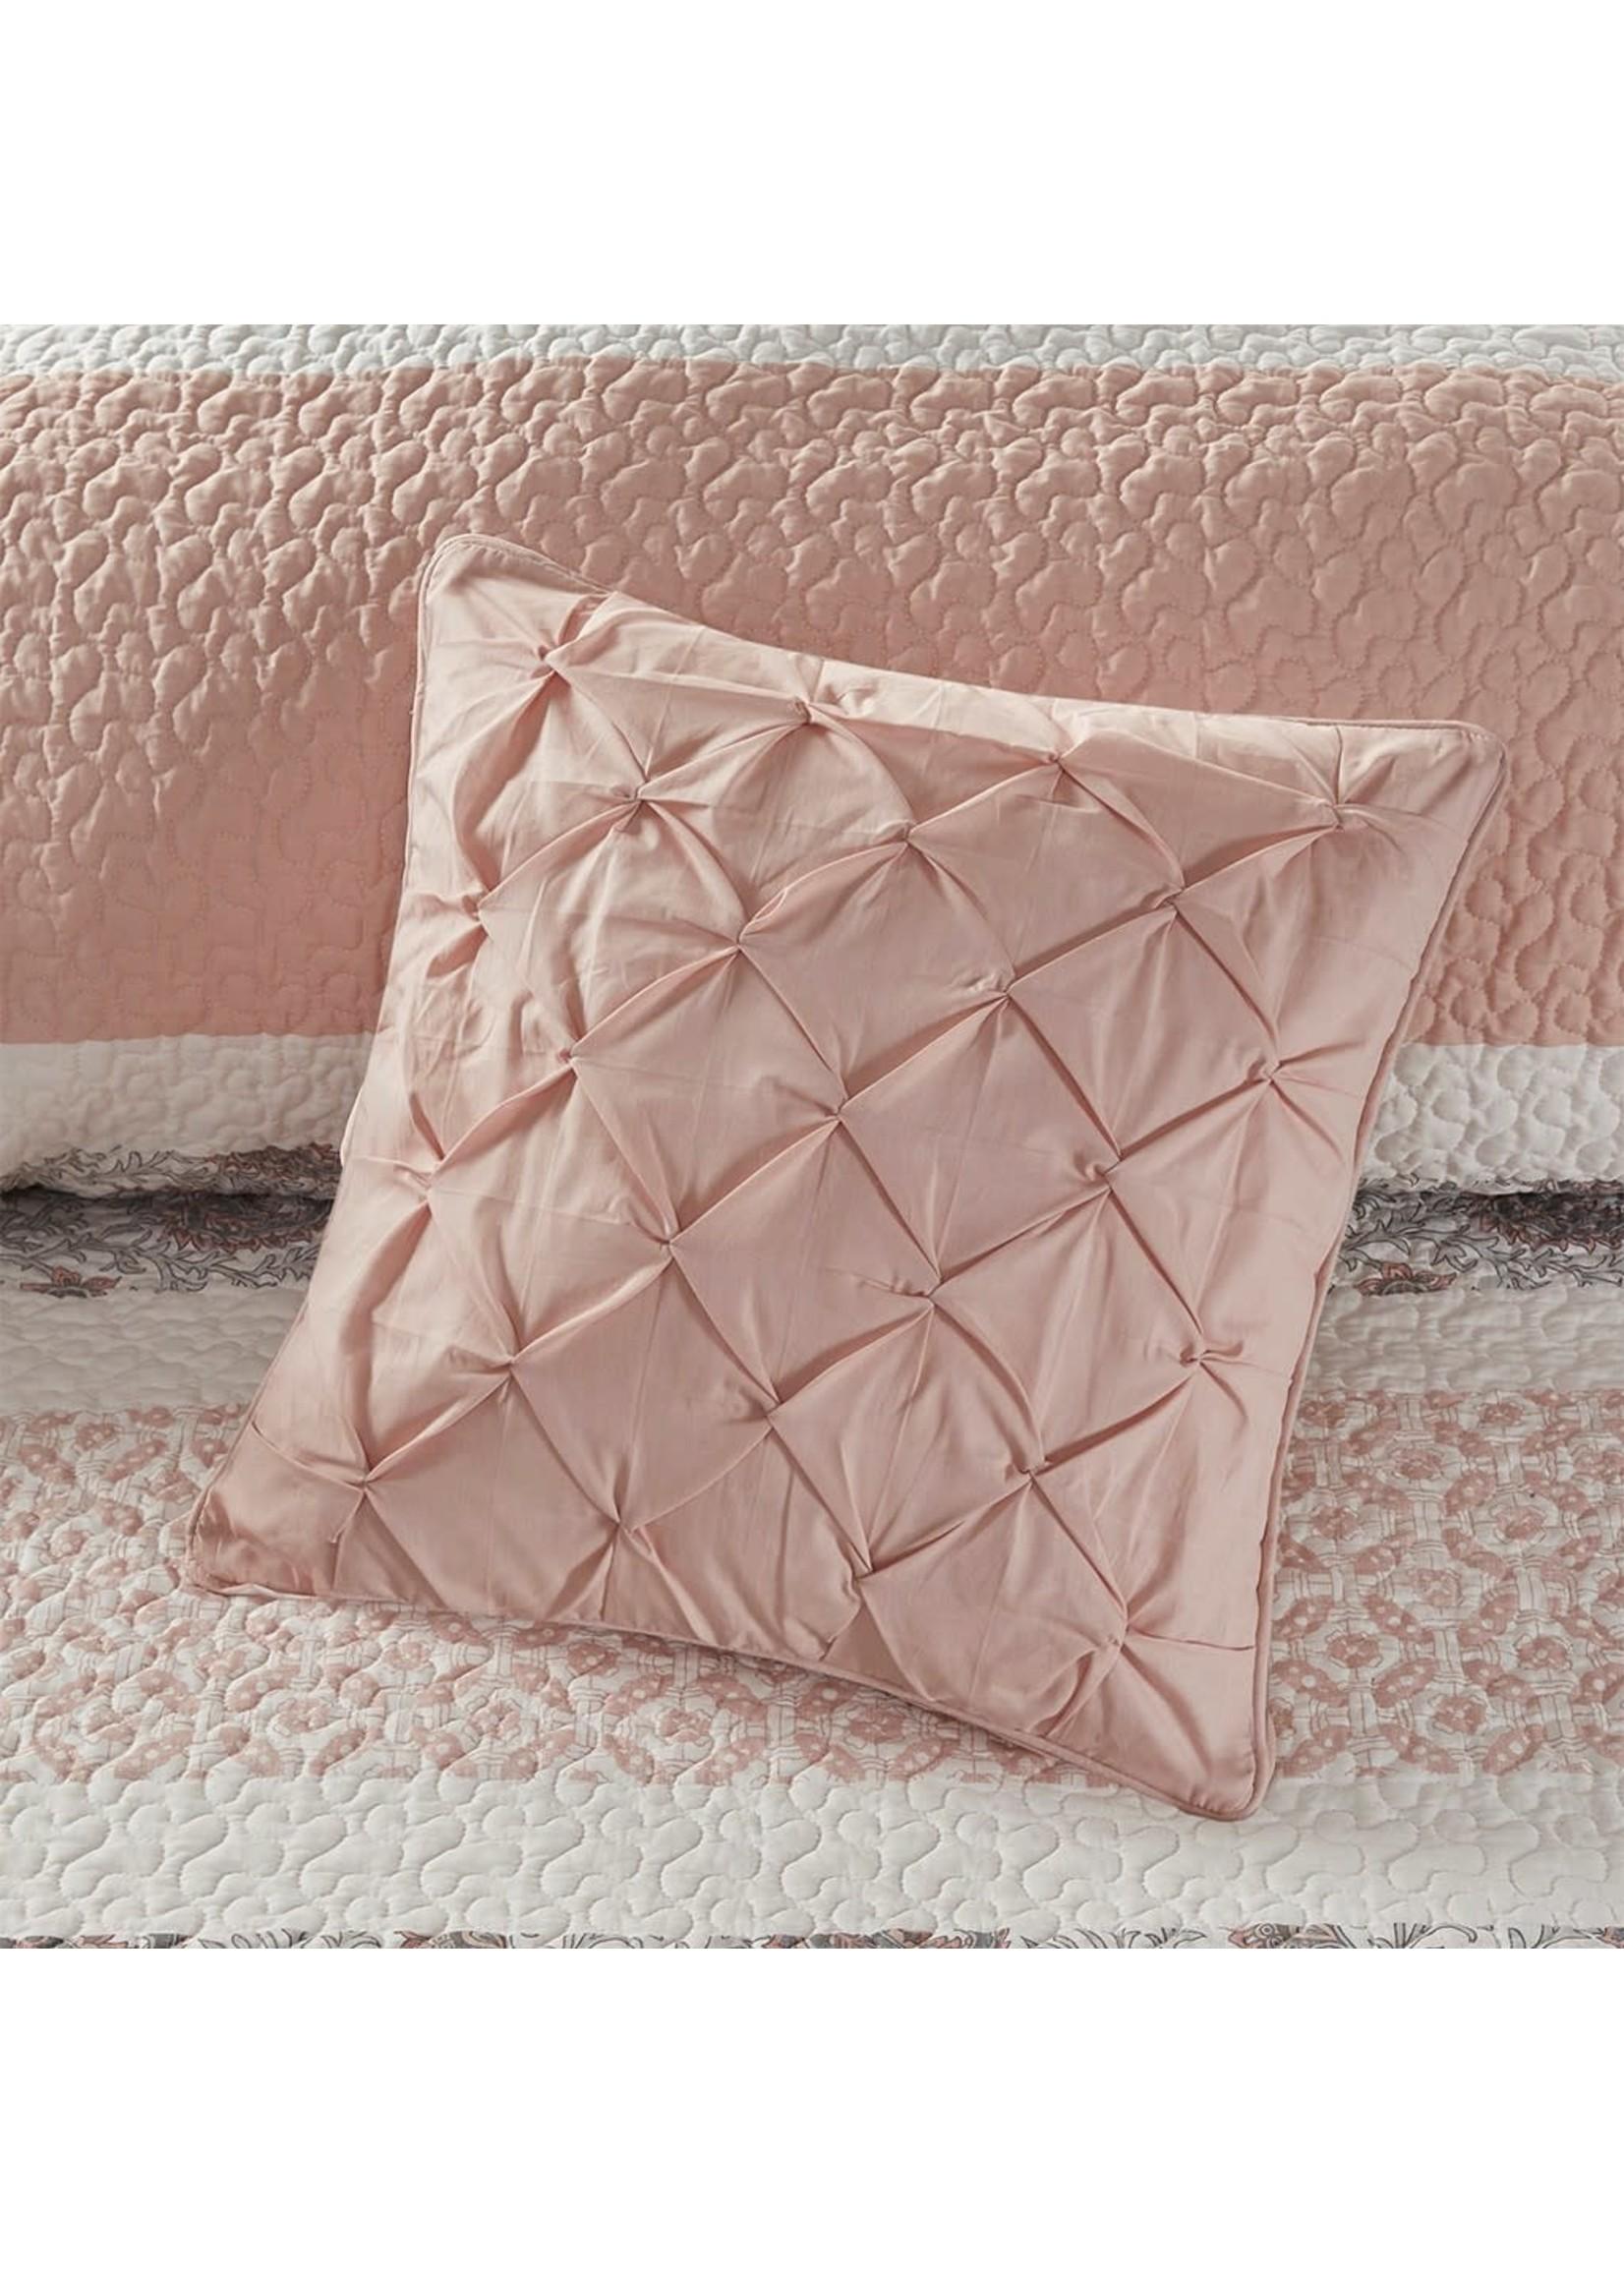 Olliix OLLIIX Dawn 6pc Cotton Percale Rev Coverlet Set Blush KING